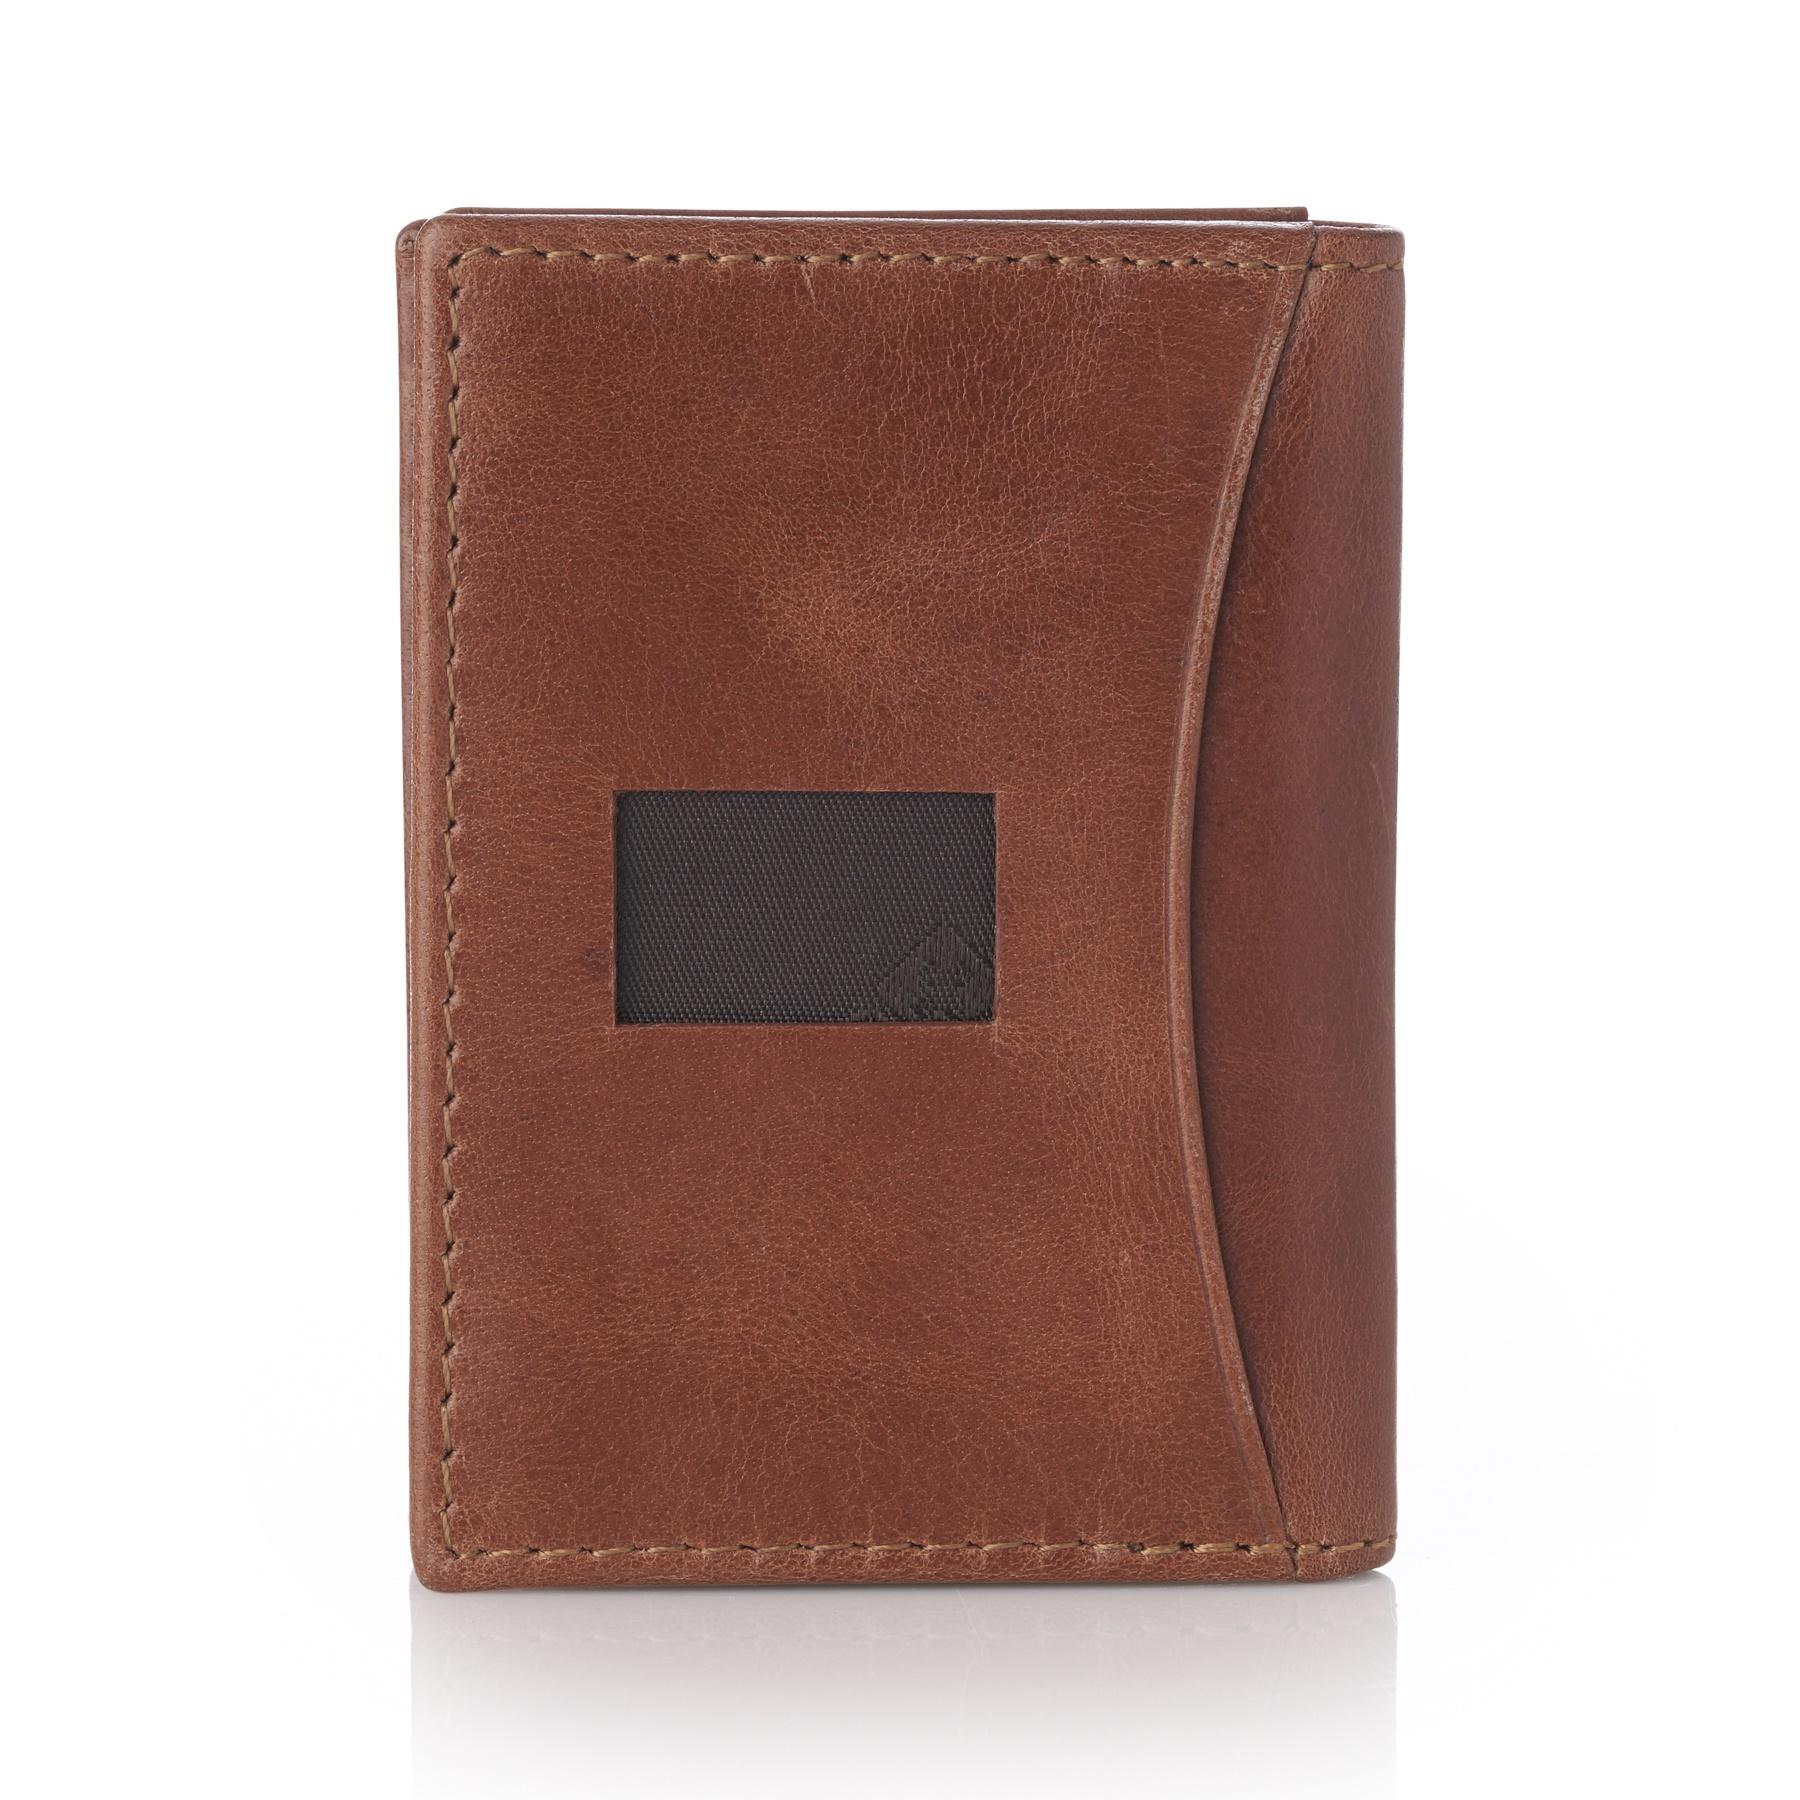 Alpine-Swiss-RFID-Leather-Business-Card-Wallet-Minimalist-ID-Window-Card-Holder thumbnail 23